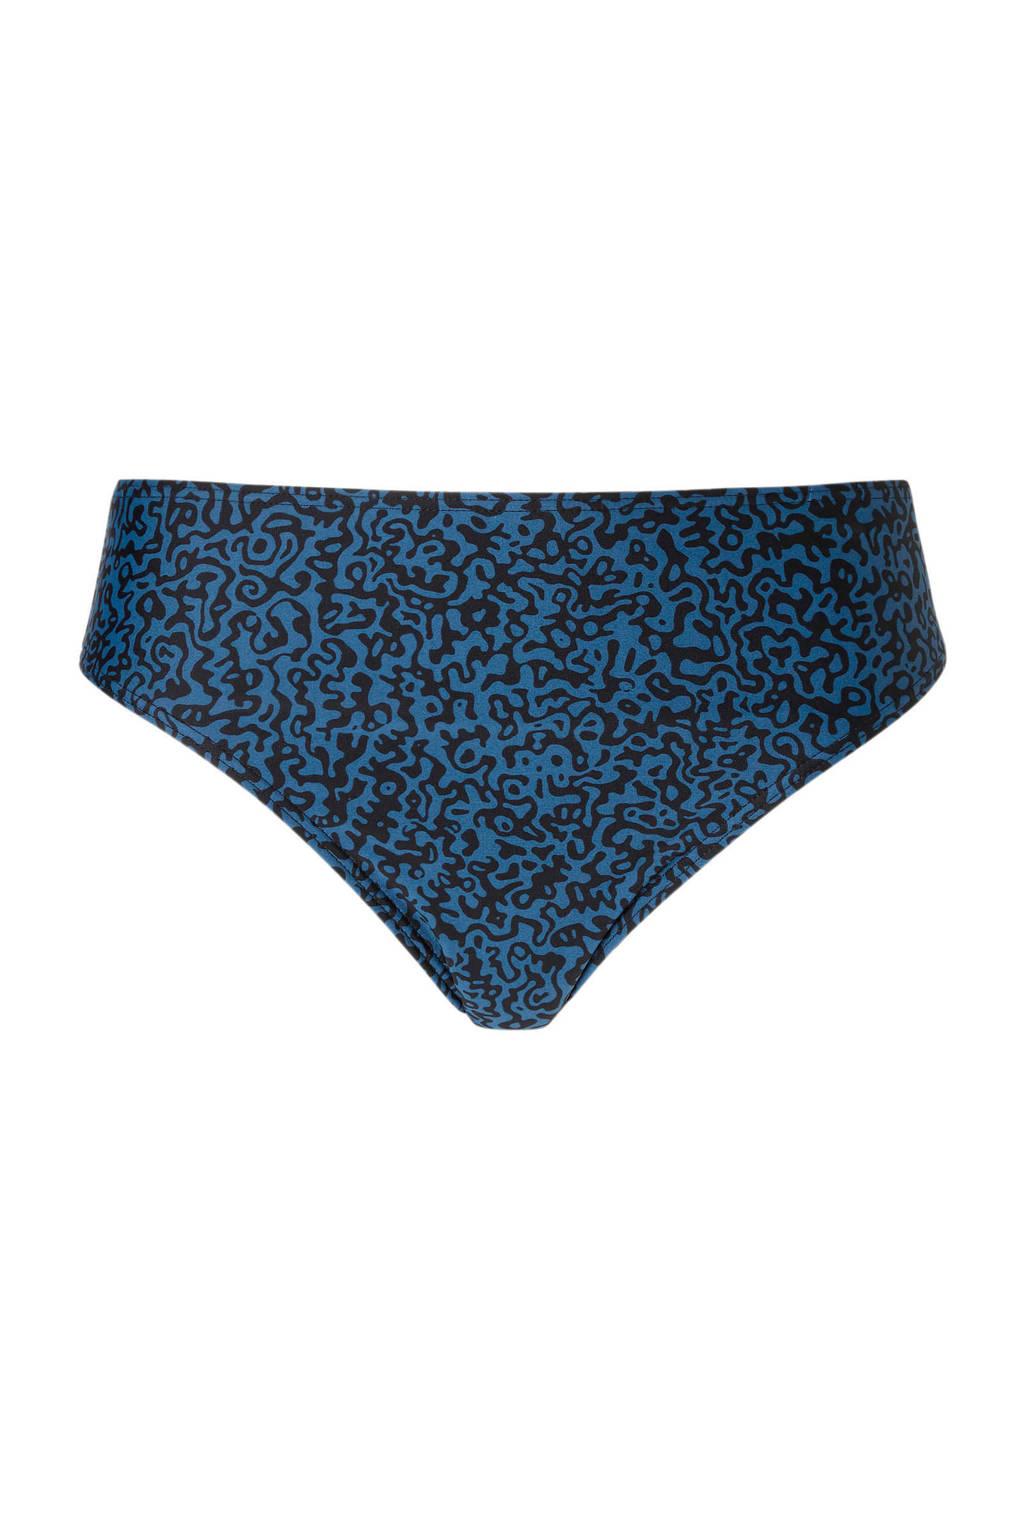 whkmp's beachwave Mix & Match bikinibroekje gevoerd in all over print blauw, Blauw/zwart